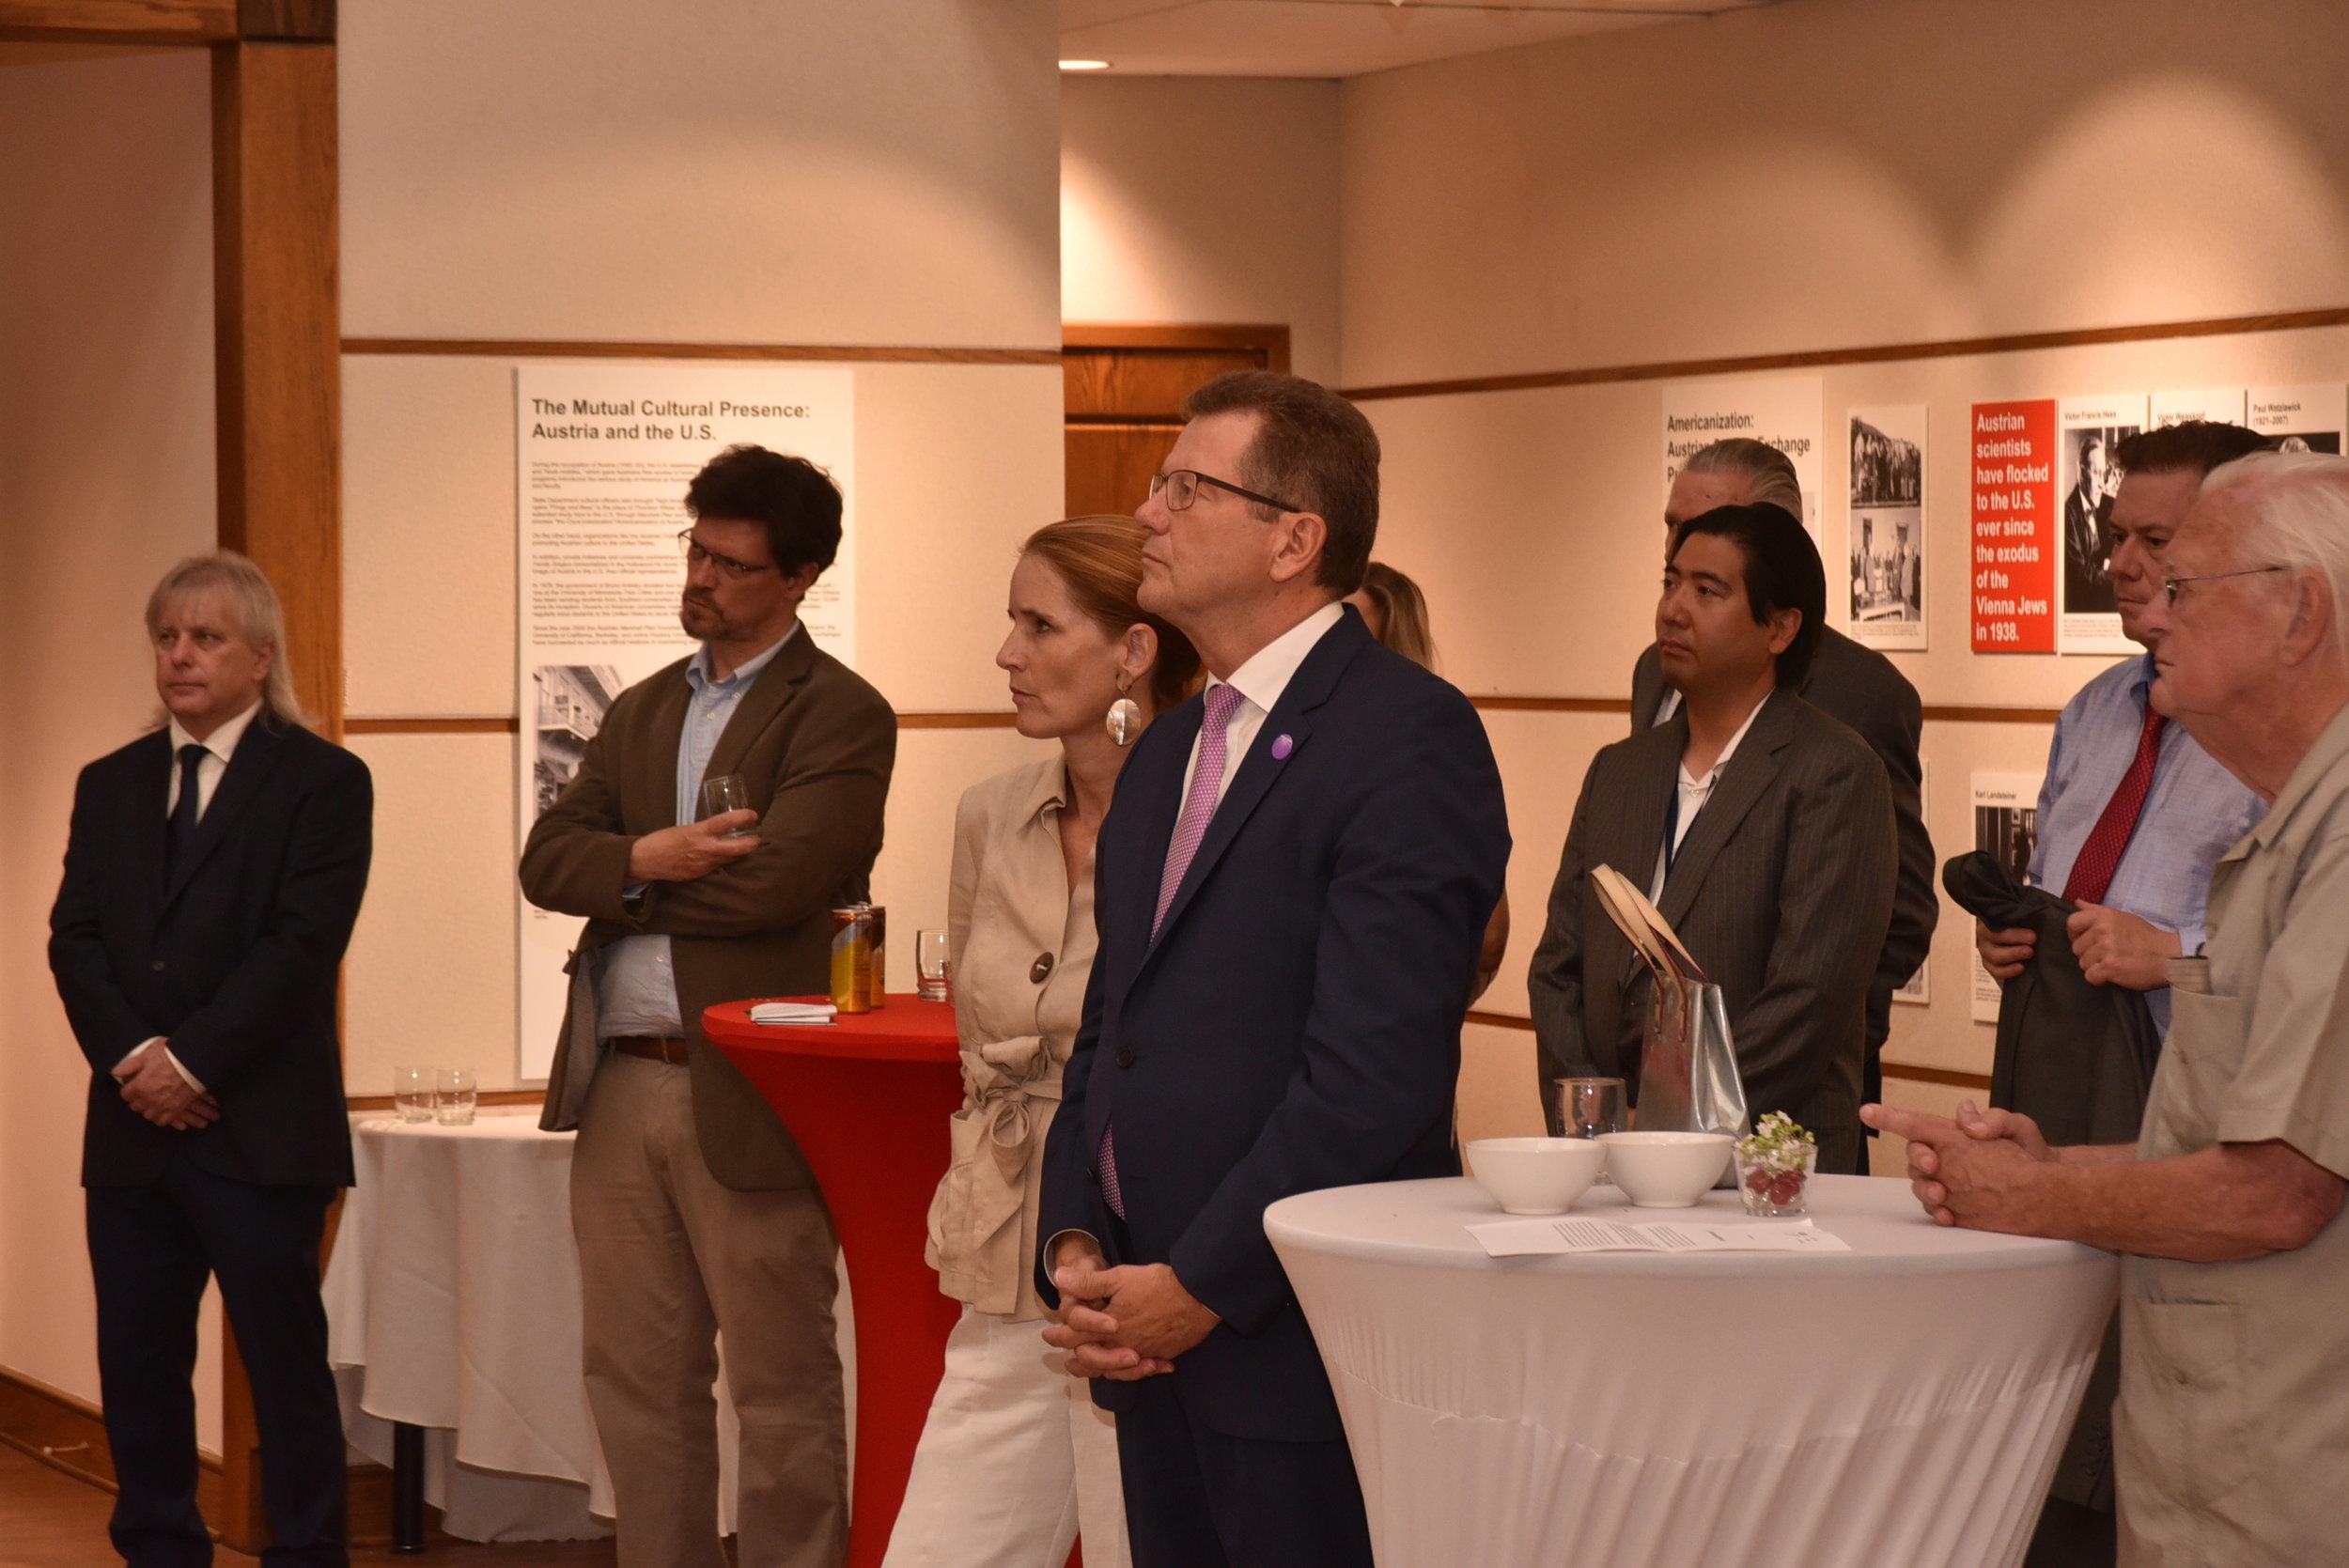 Ambassador Waldner and guests during Professor Bischof's remarks.   Photo: Peter Alunans